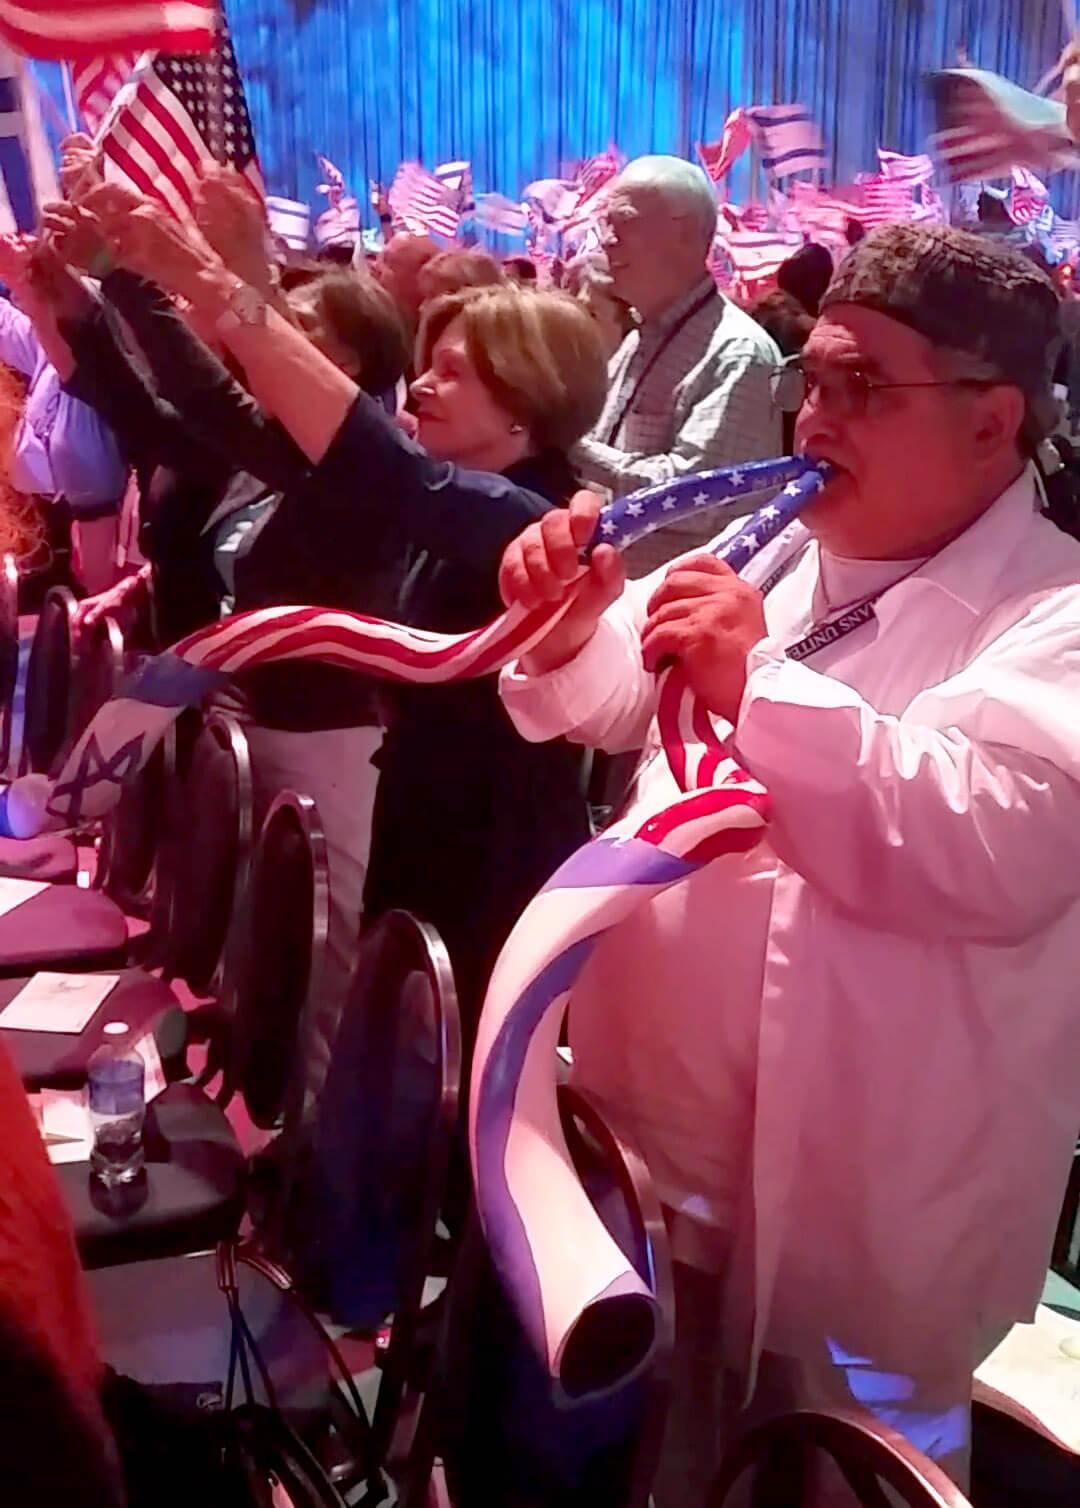 A CUFI attendee with a US/Israeli flag shofar